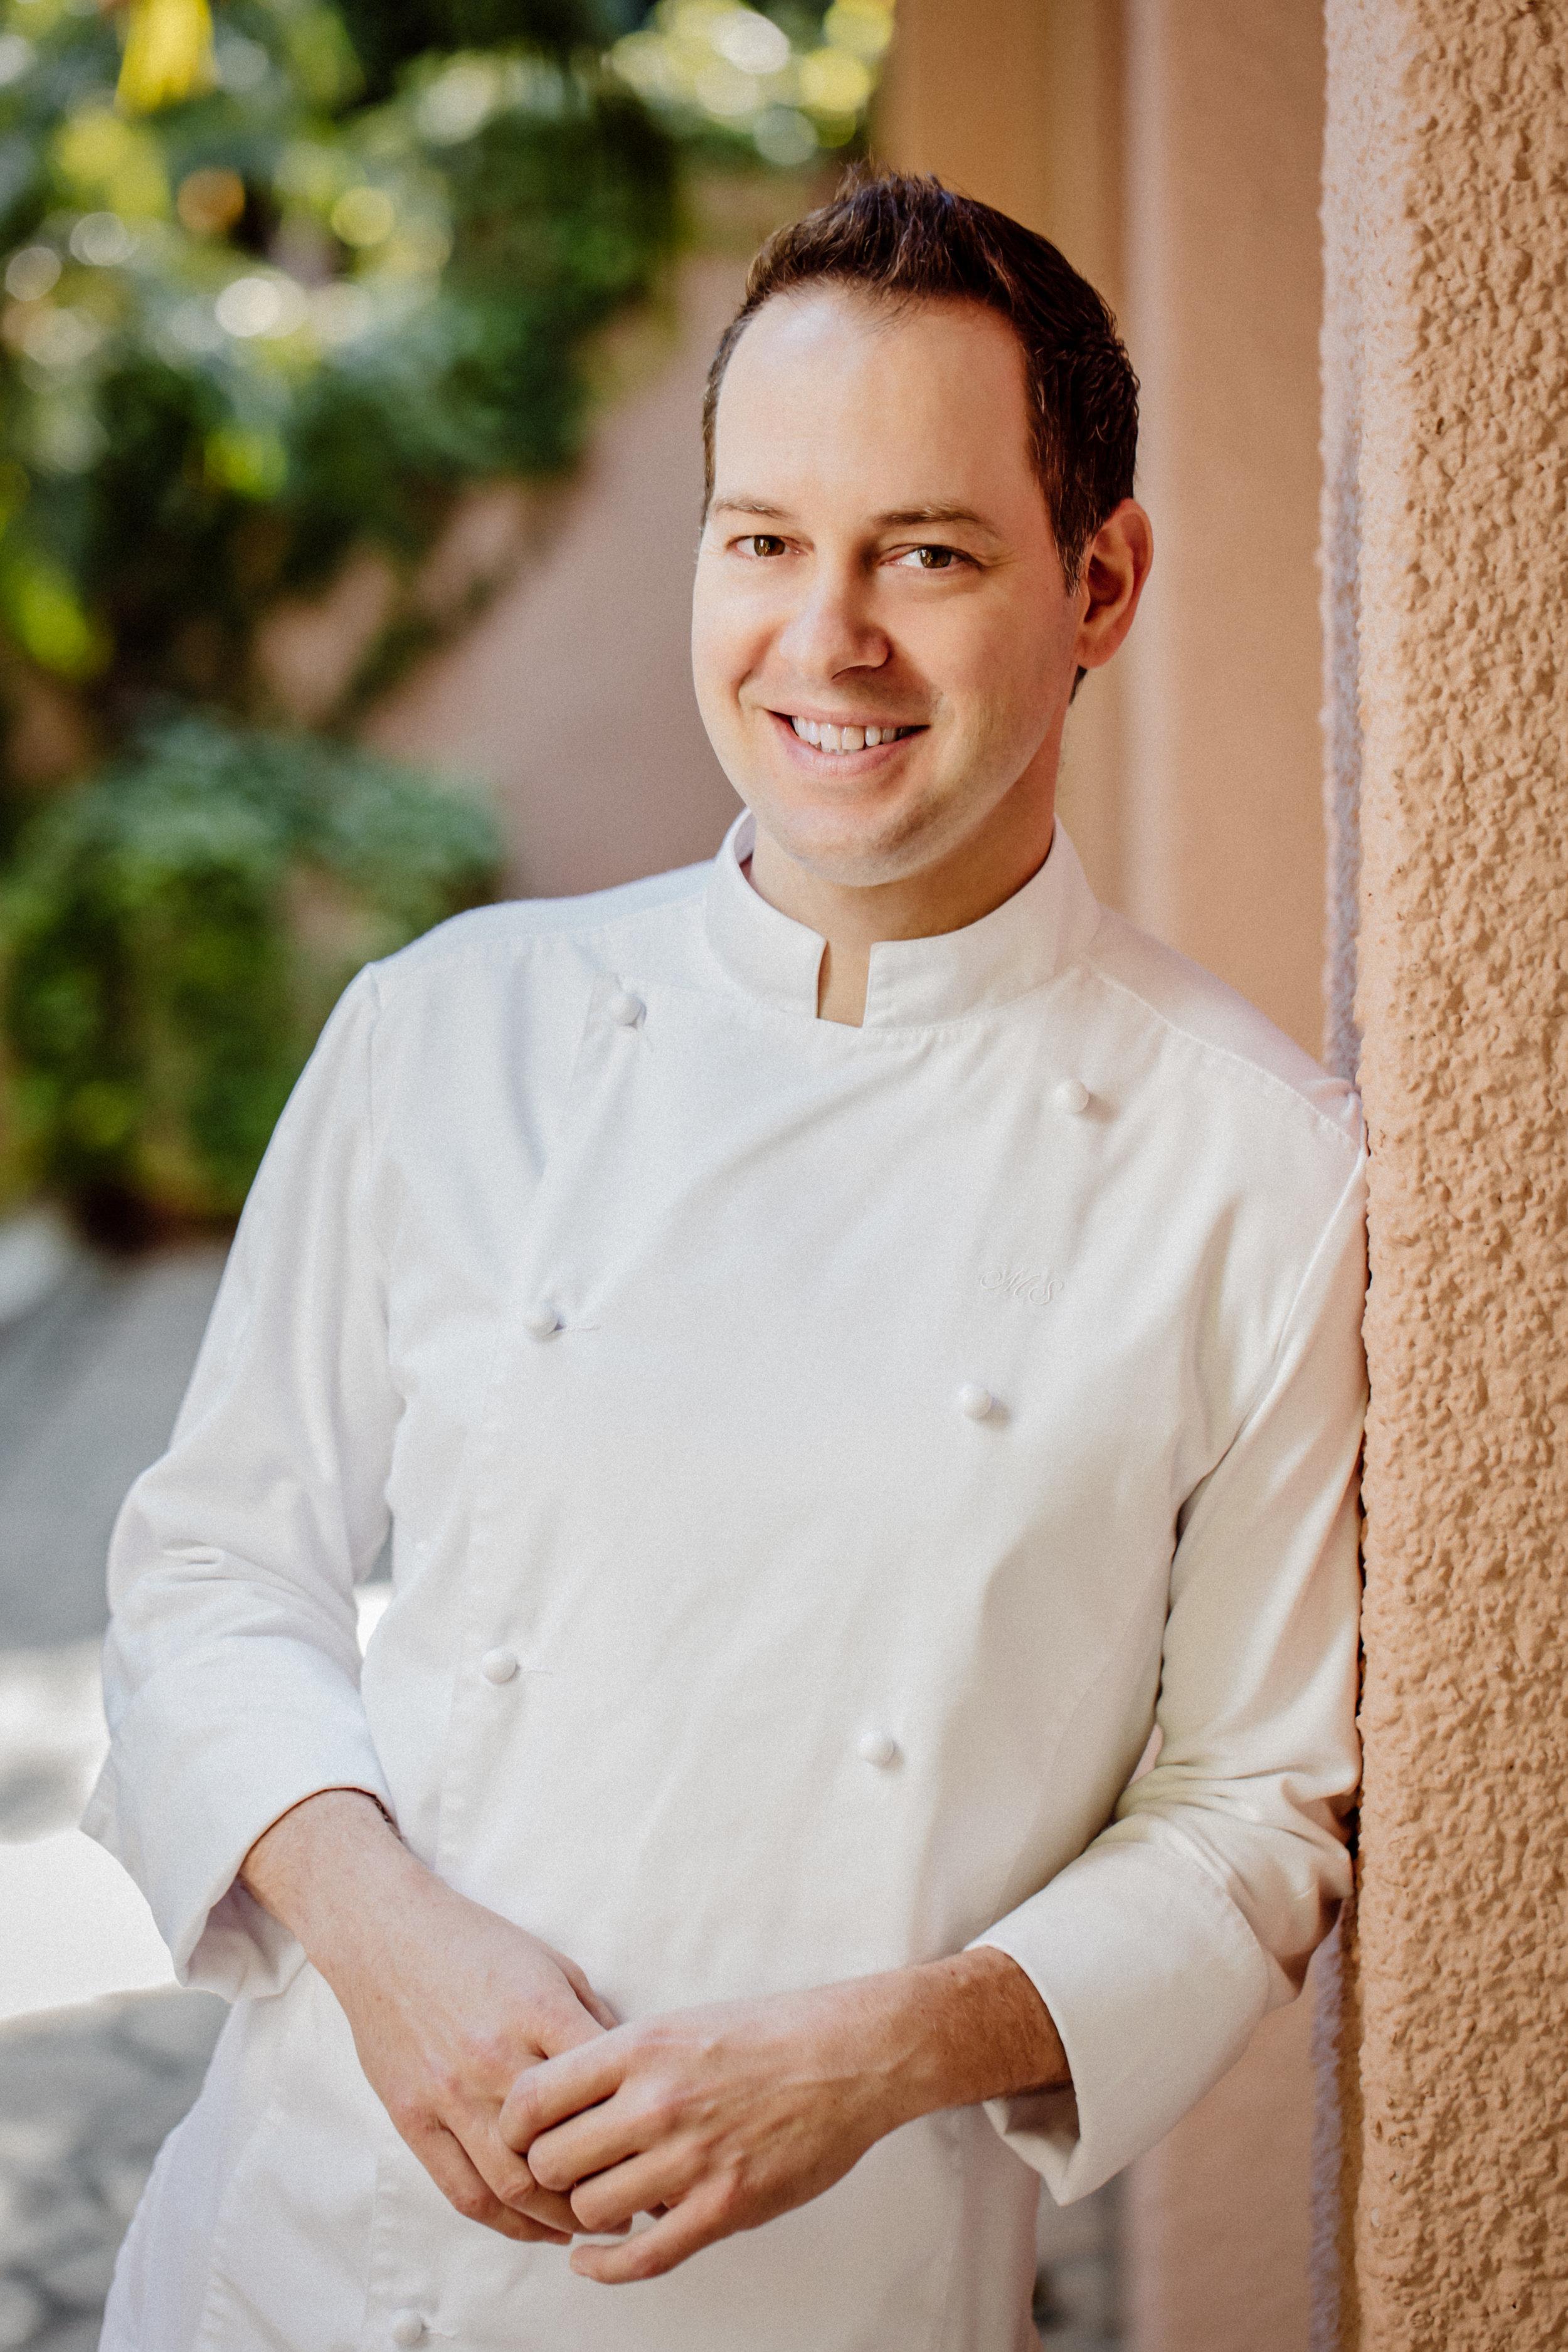 chef-michael-santoro-beverly-hills-hotel